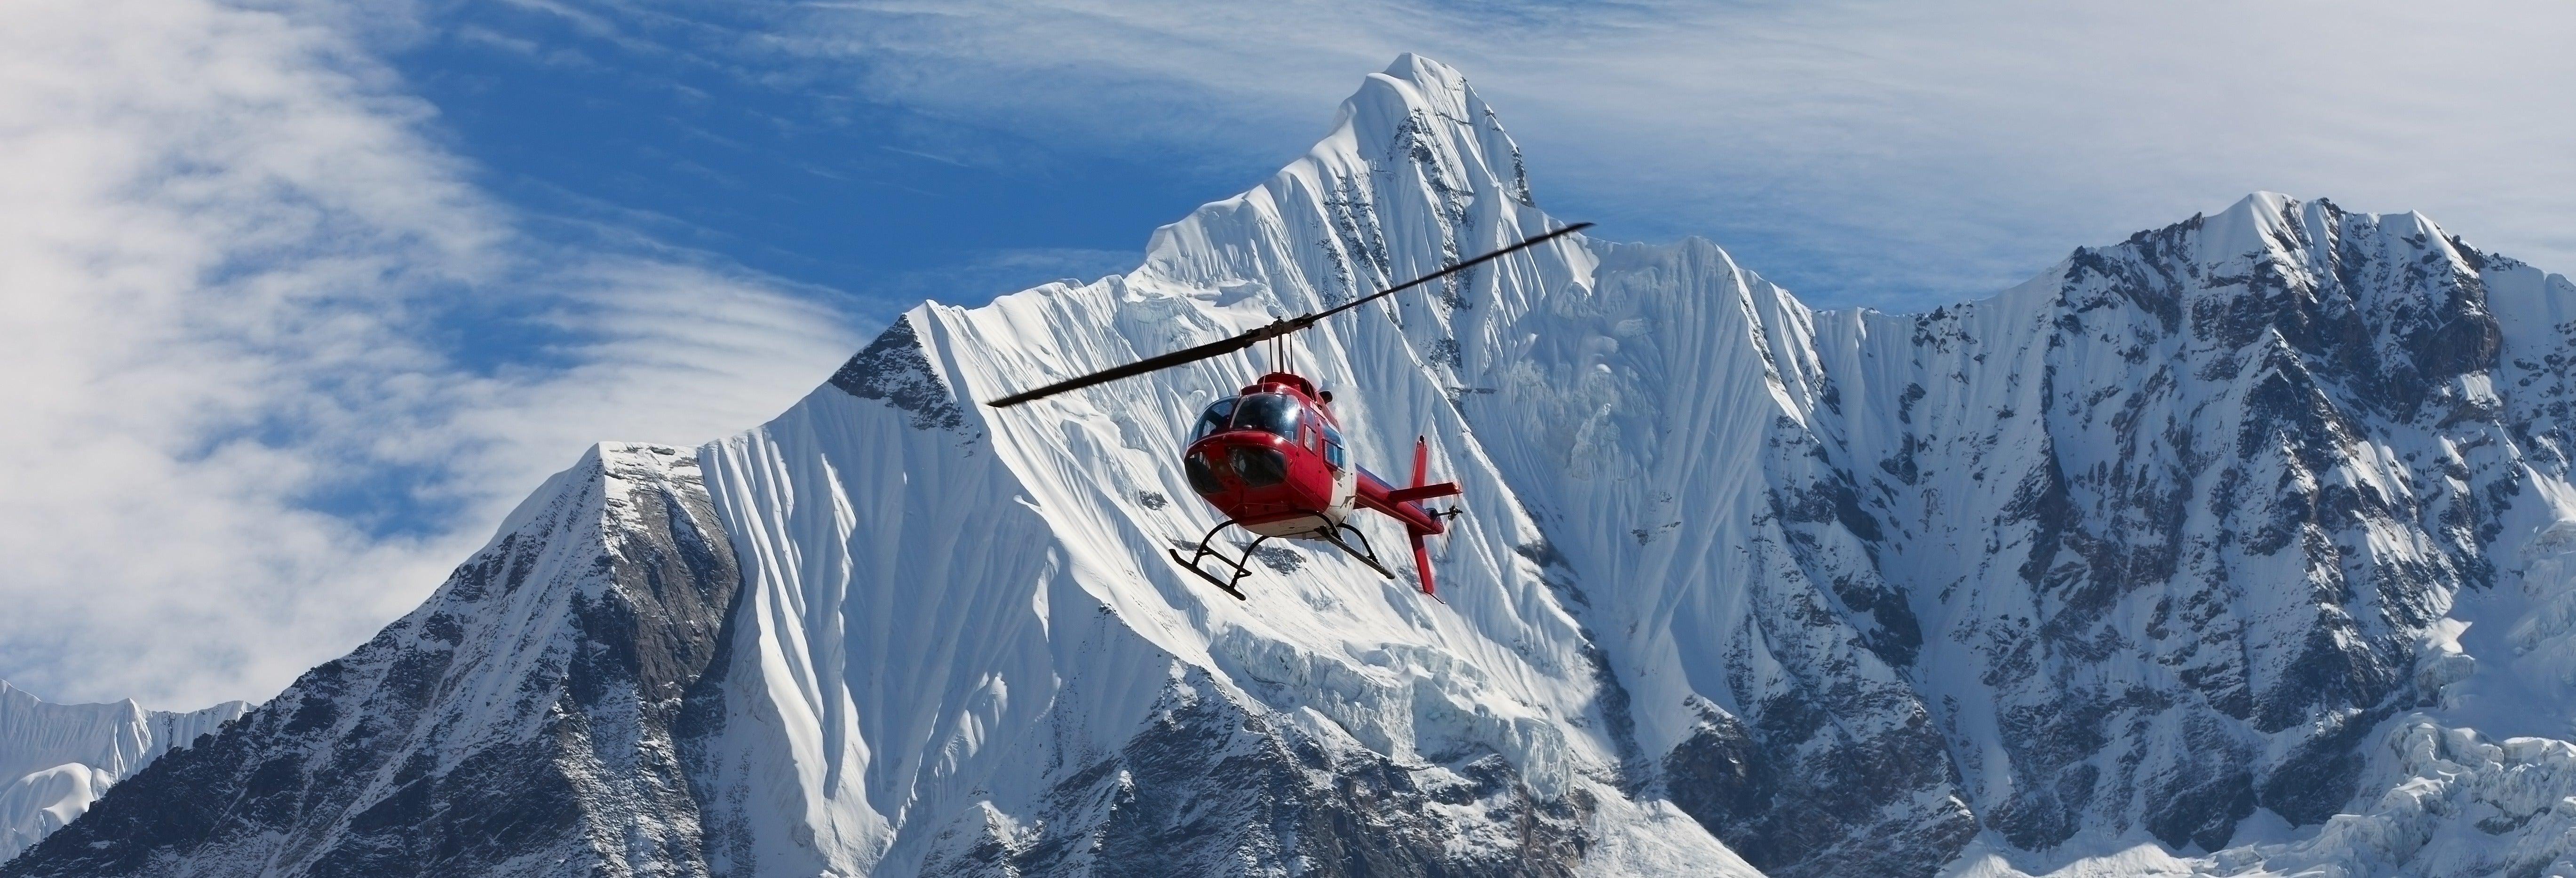 Passeio de helicóptero pelo Mont Blanc